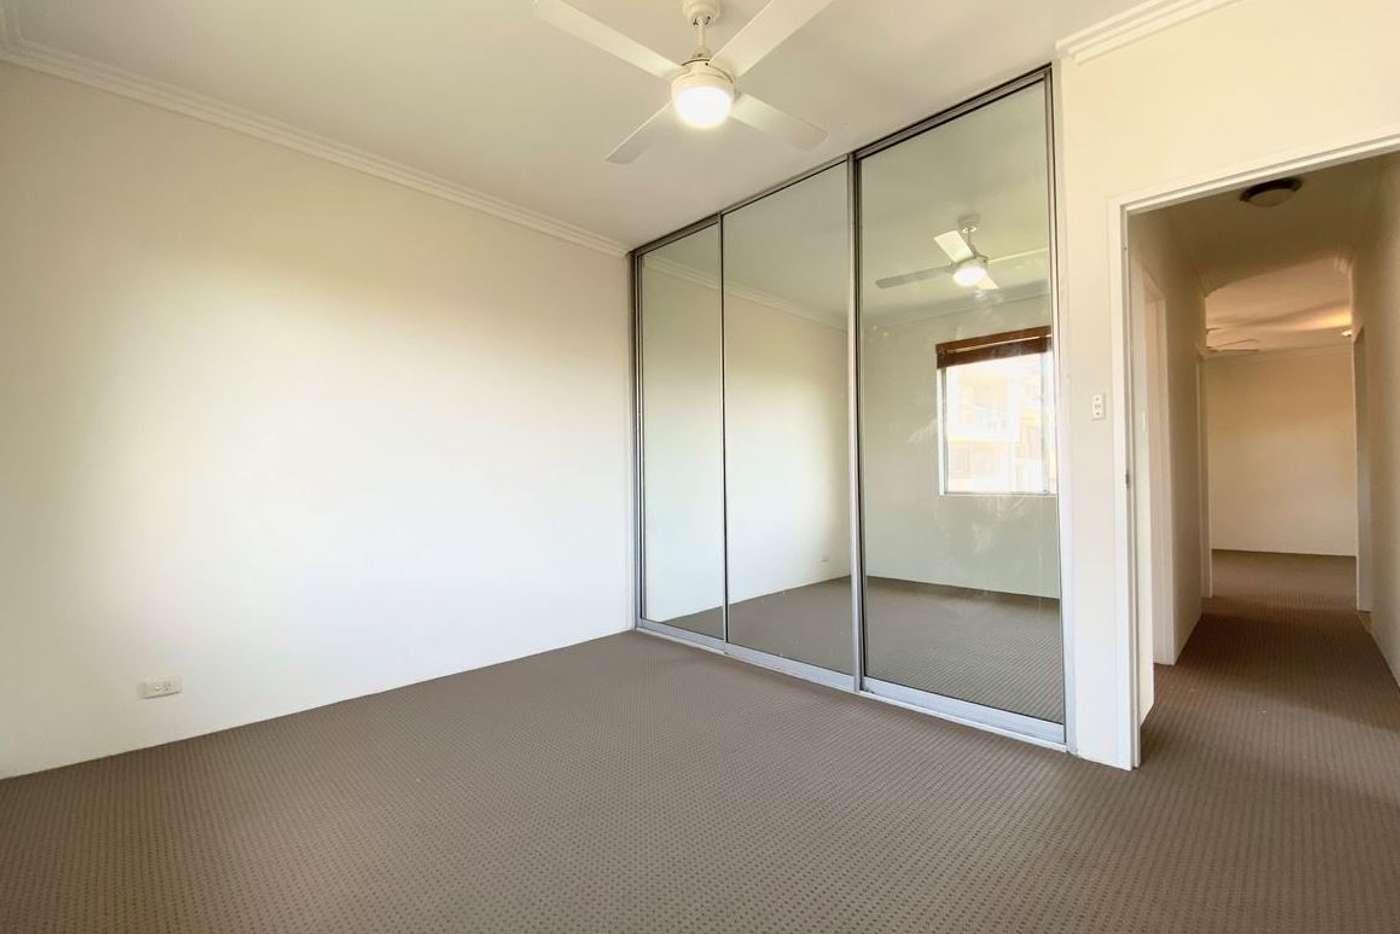 Third view of Homely apartment listing, 15/42 Premier Street, Kogarah NSW 2217